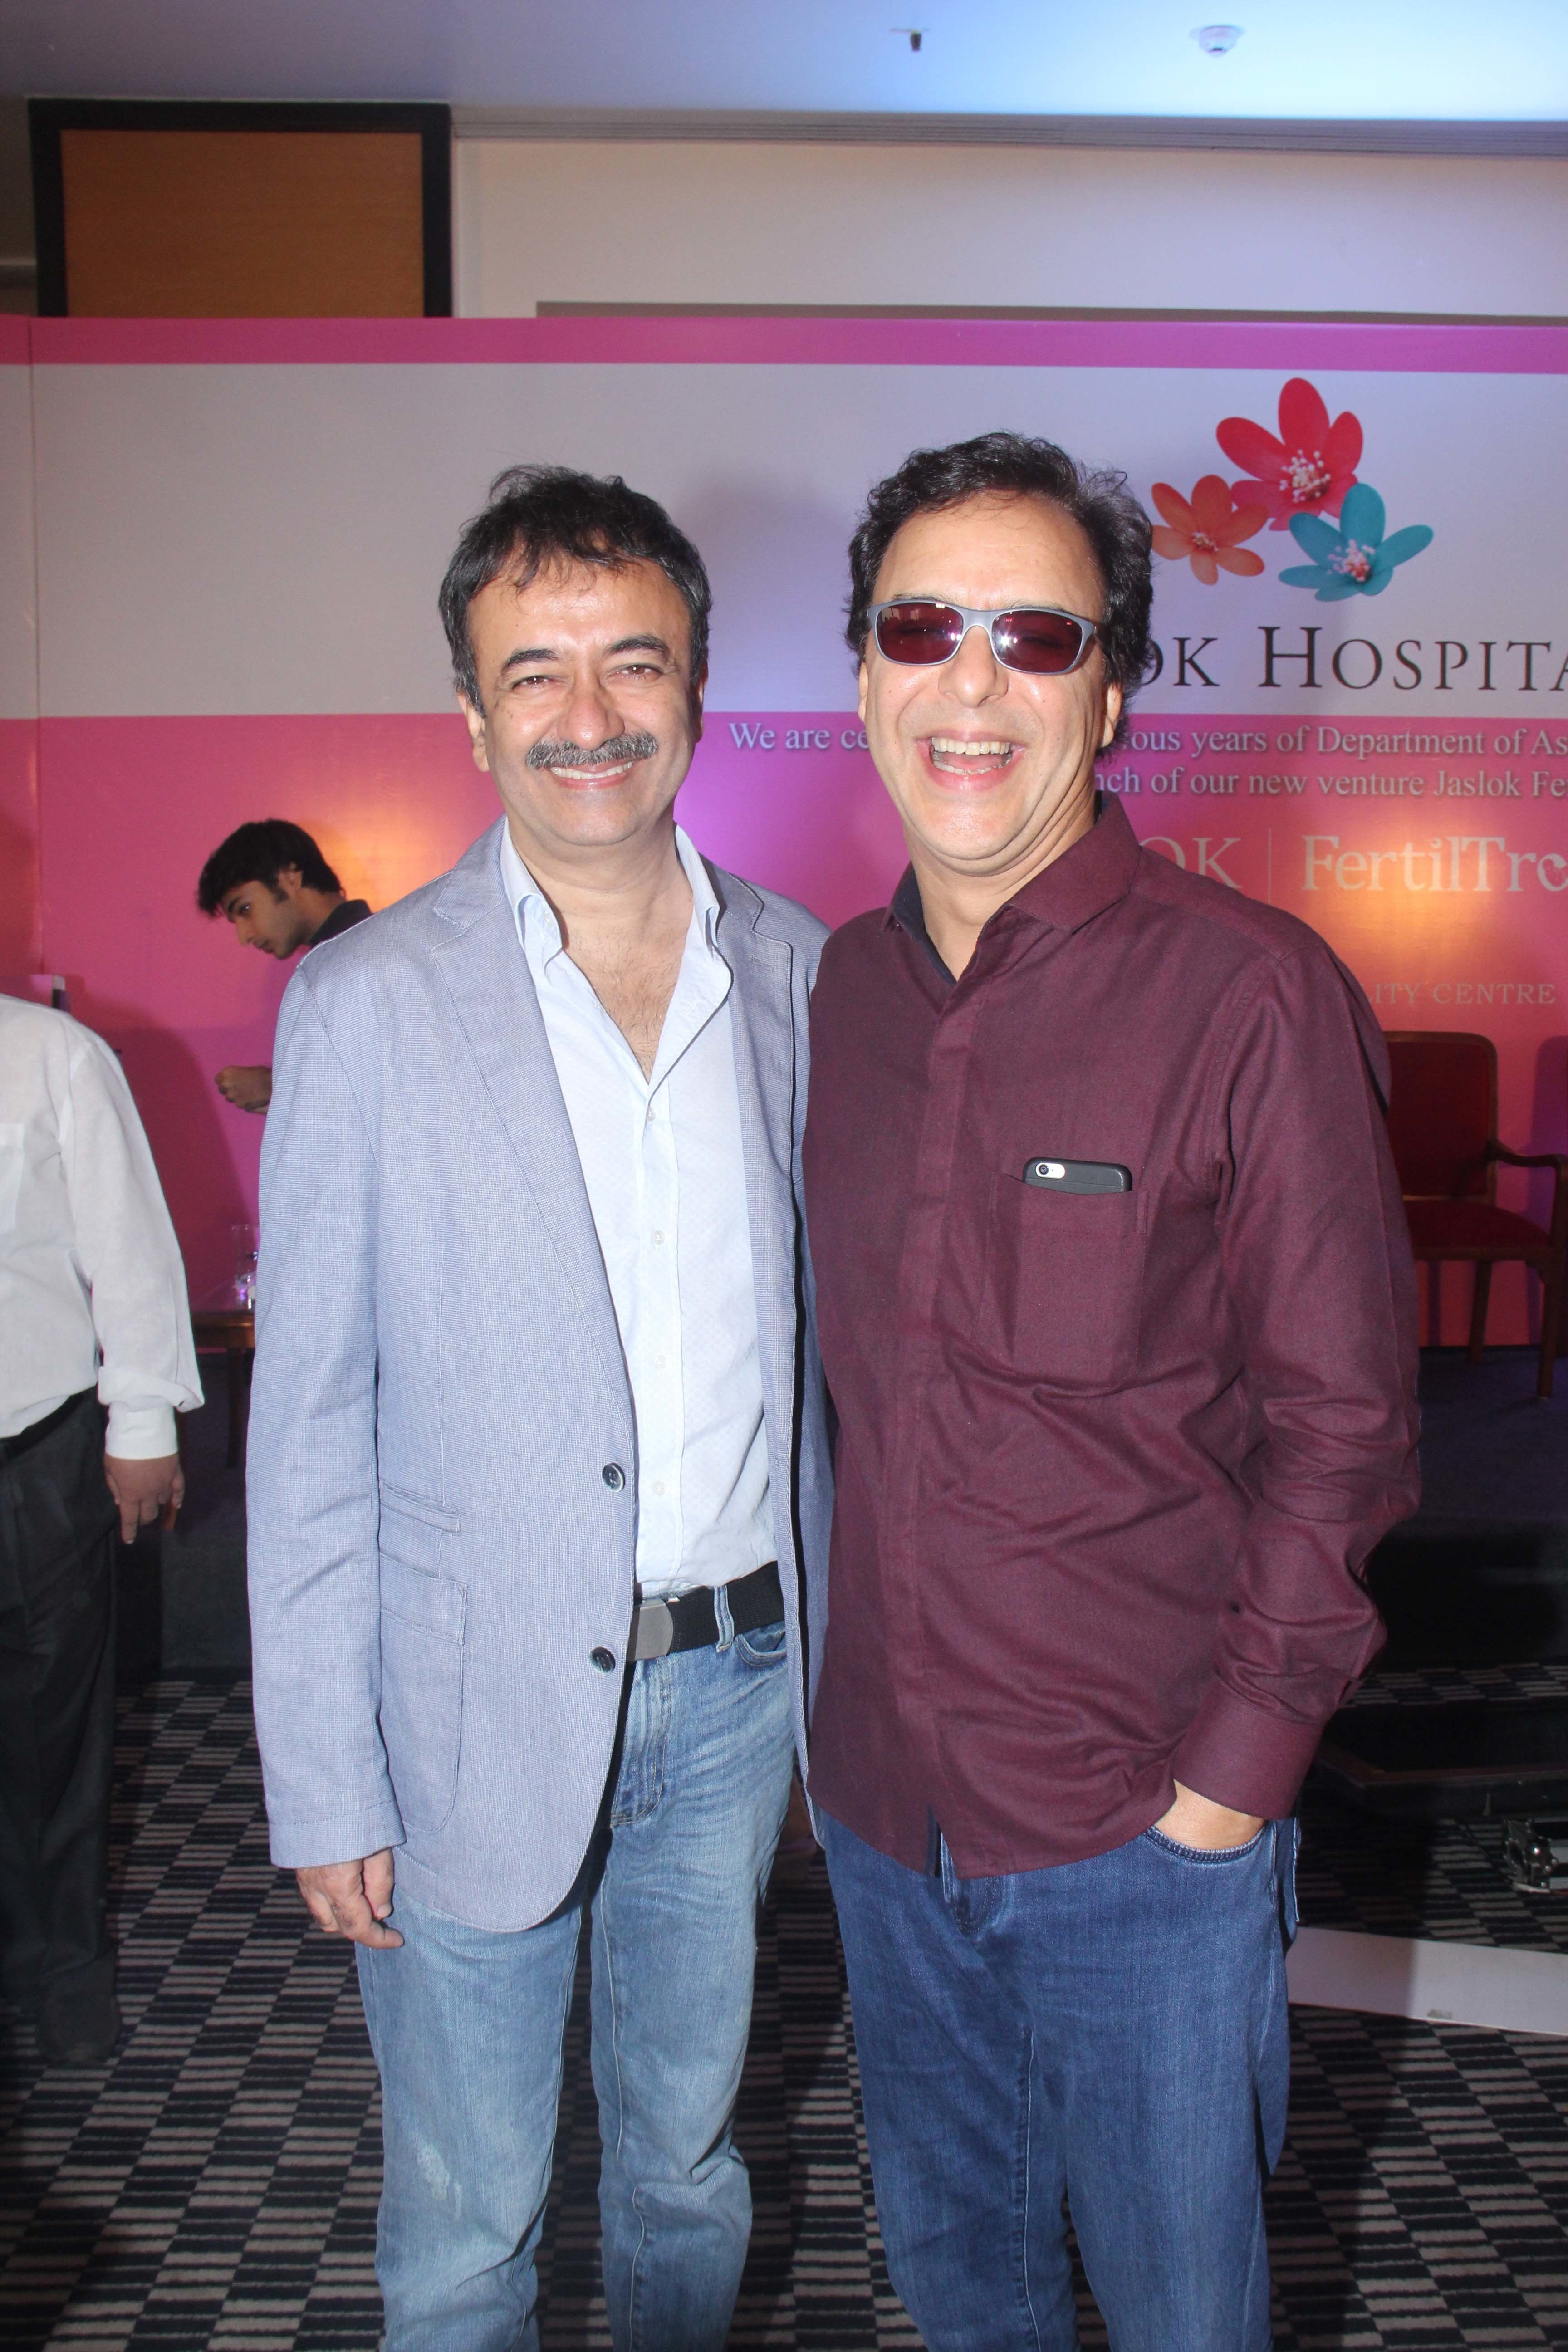 A file photo of Rajkumar Hirani (left) and Vidhu Vinod